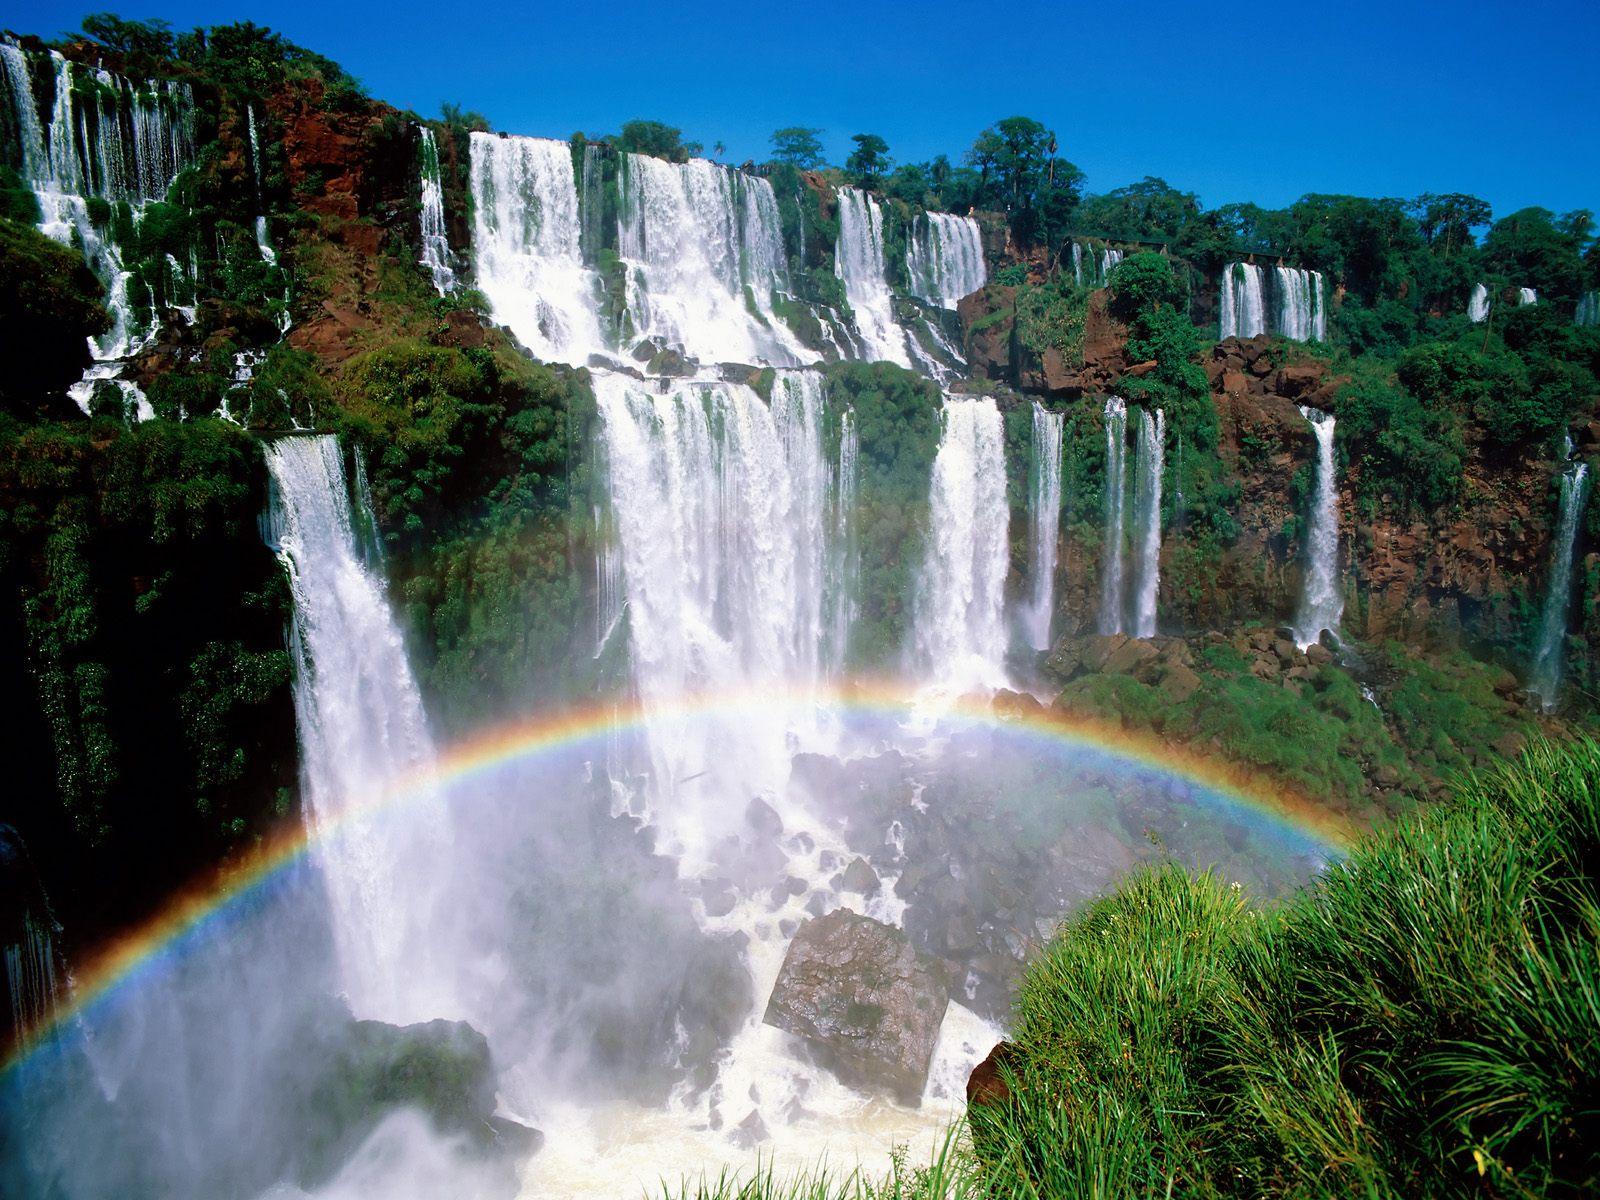 HQ Iguazu National Park Argentina Wallpaper   HQ Wallpapers 1600x1200